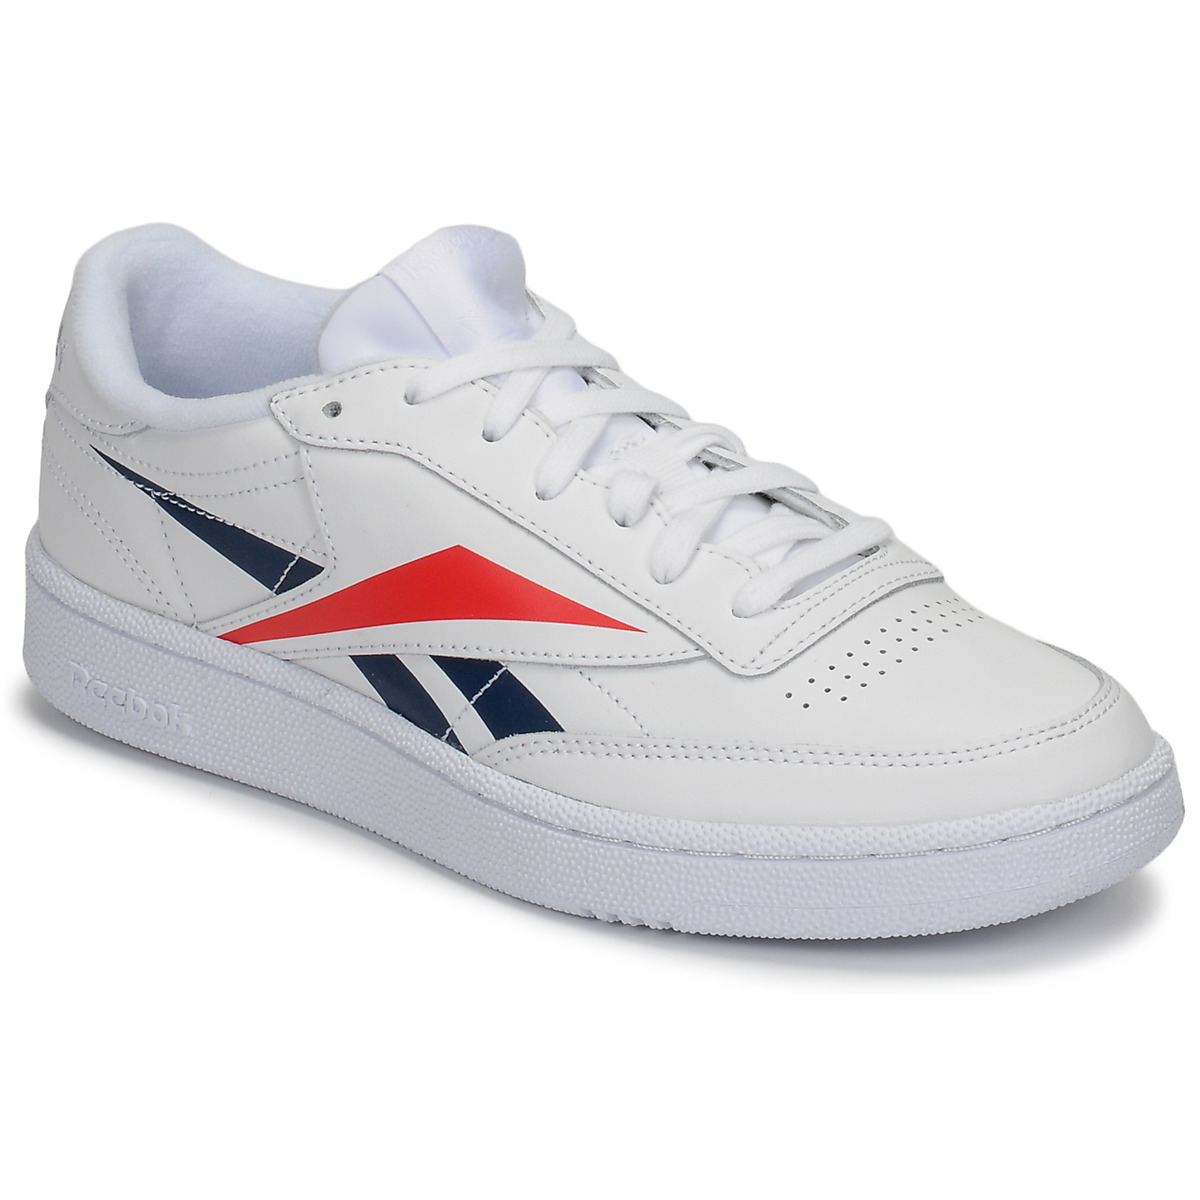 reebok white club c 85 mu trainers